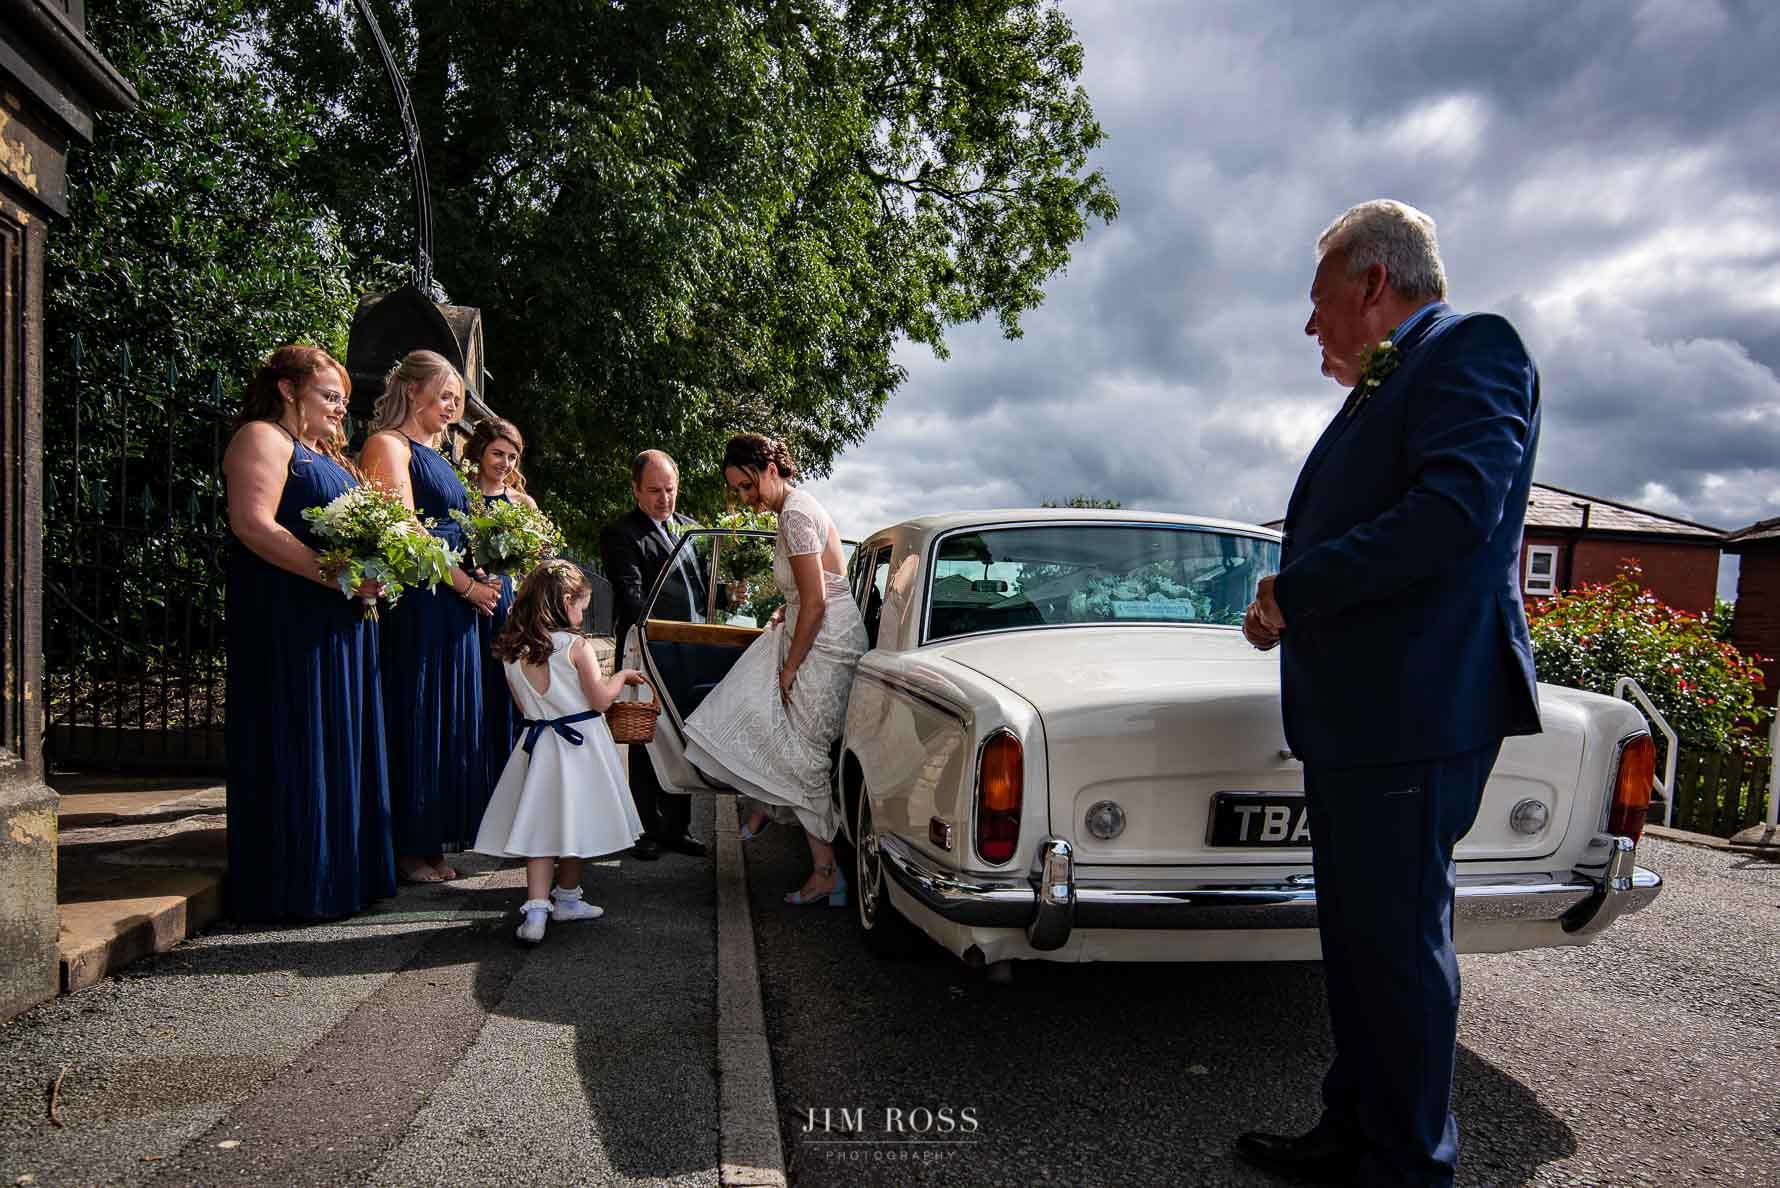 Bride arrives at Milnrow church